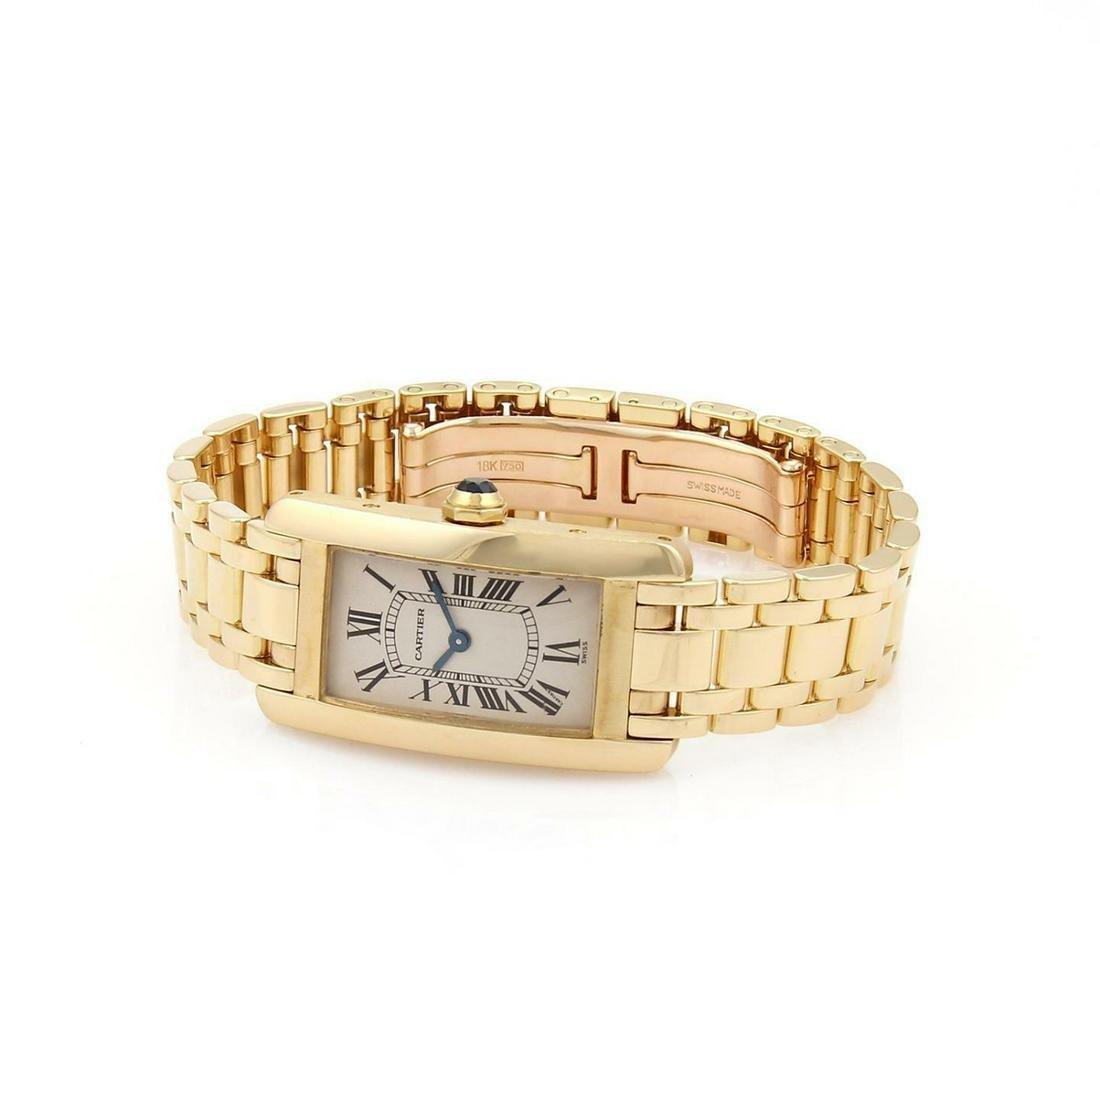 Cartier Tank Americaine 18k Ladies Quartz Wrist Watch